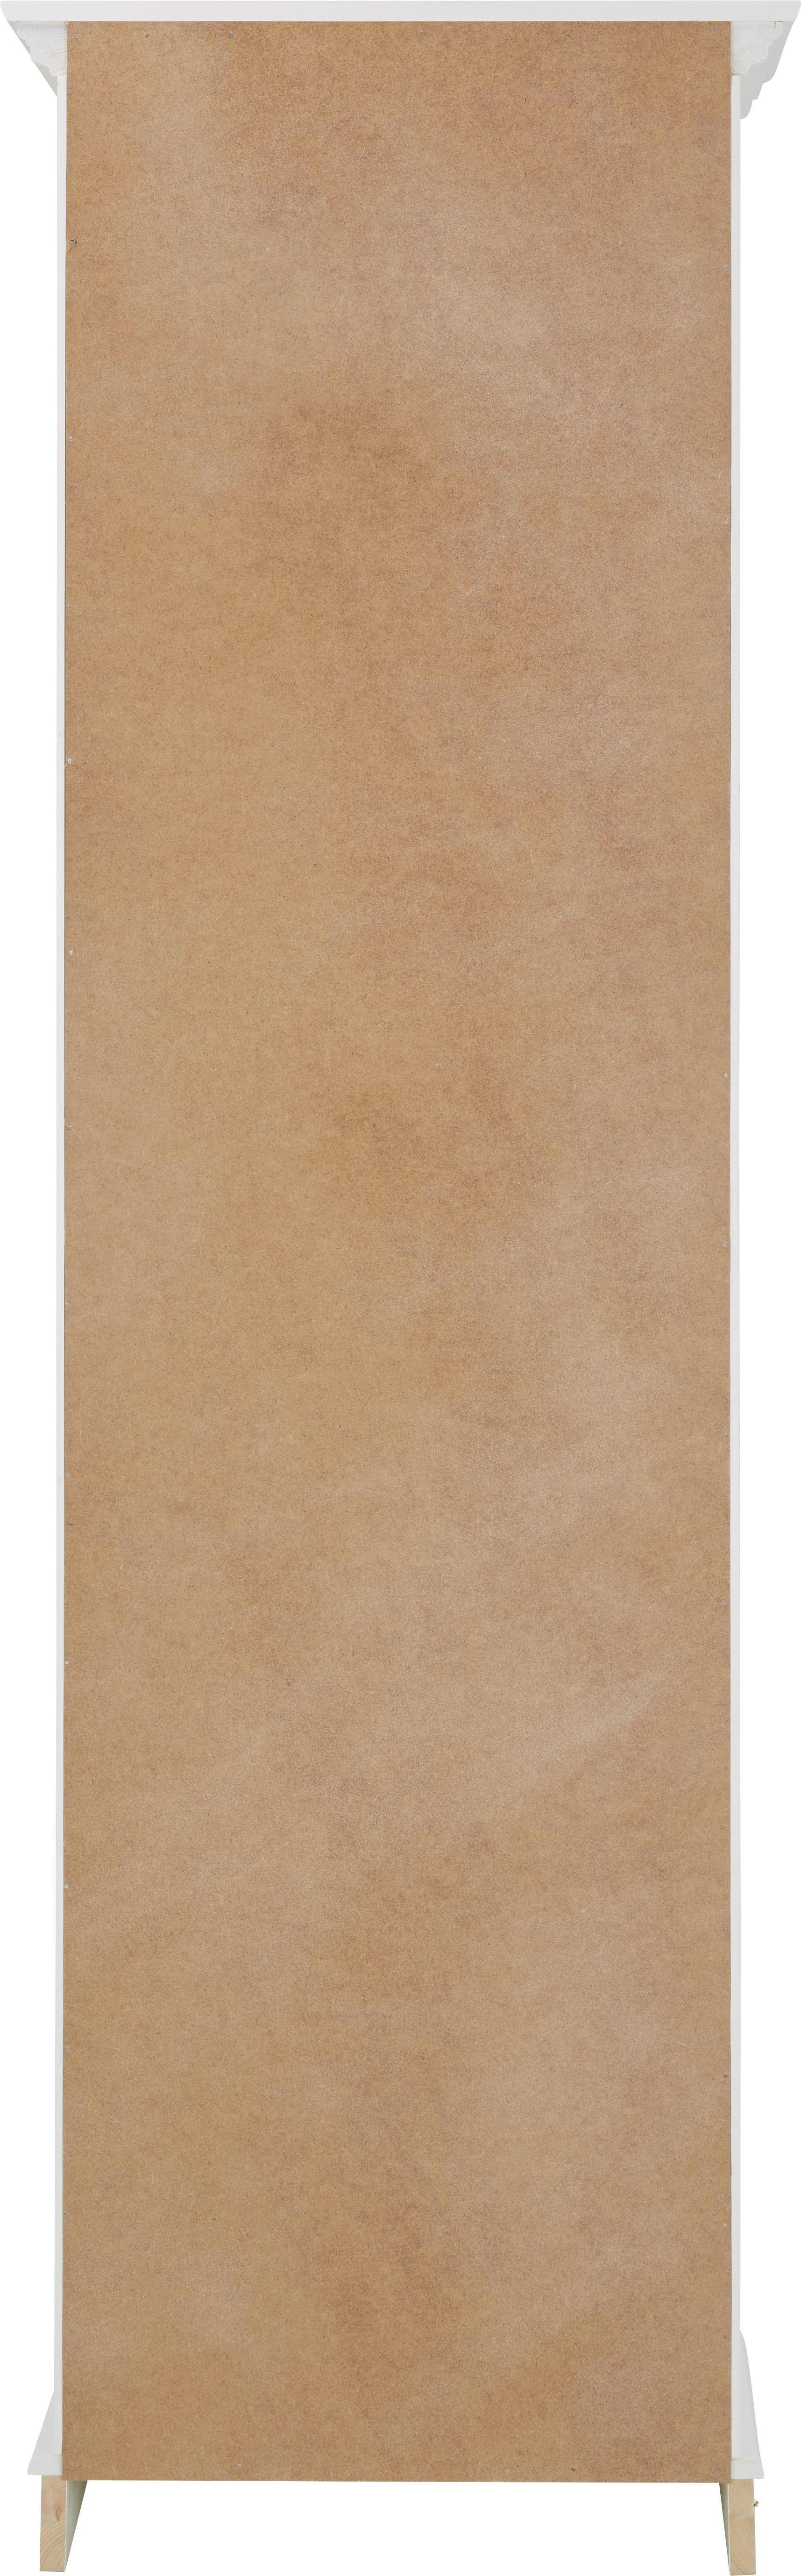 Vitrine Claudia - Weiß, Glas/Holz (59,5/190/44,5cm) - PREMIUM LIVING